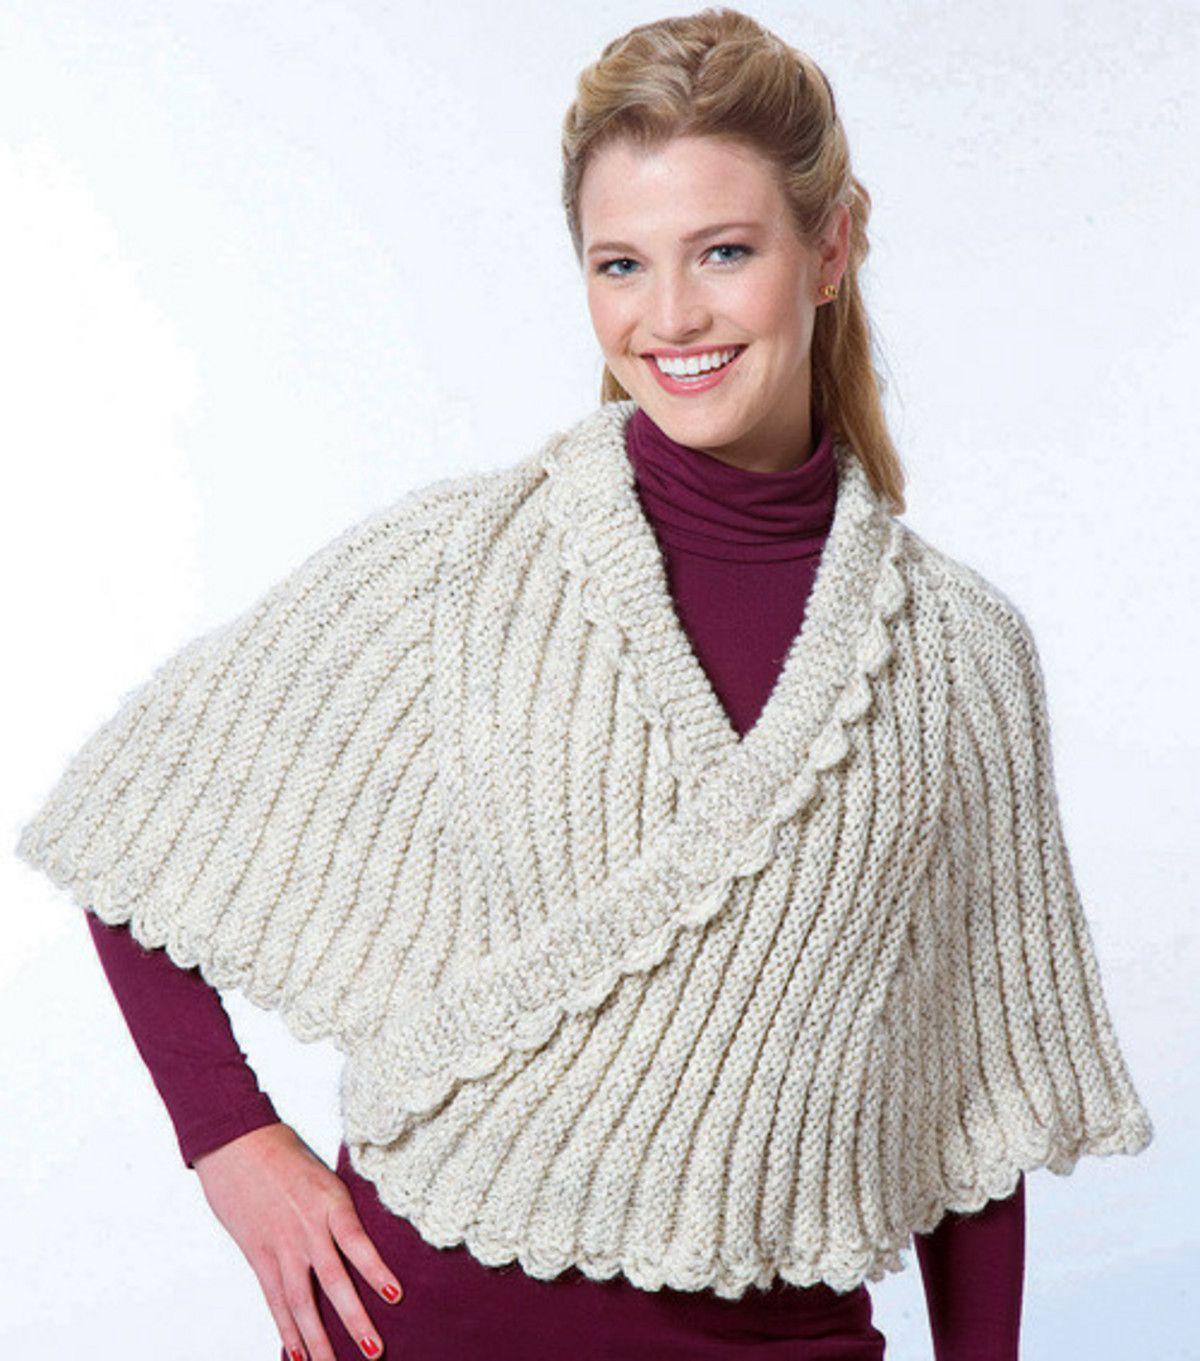 Wrap-Around Capelet | ponchos crochet y dos agujas | Pinterest ...